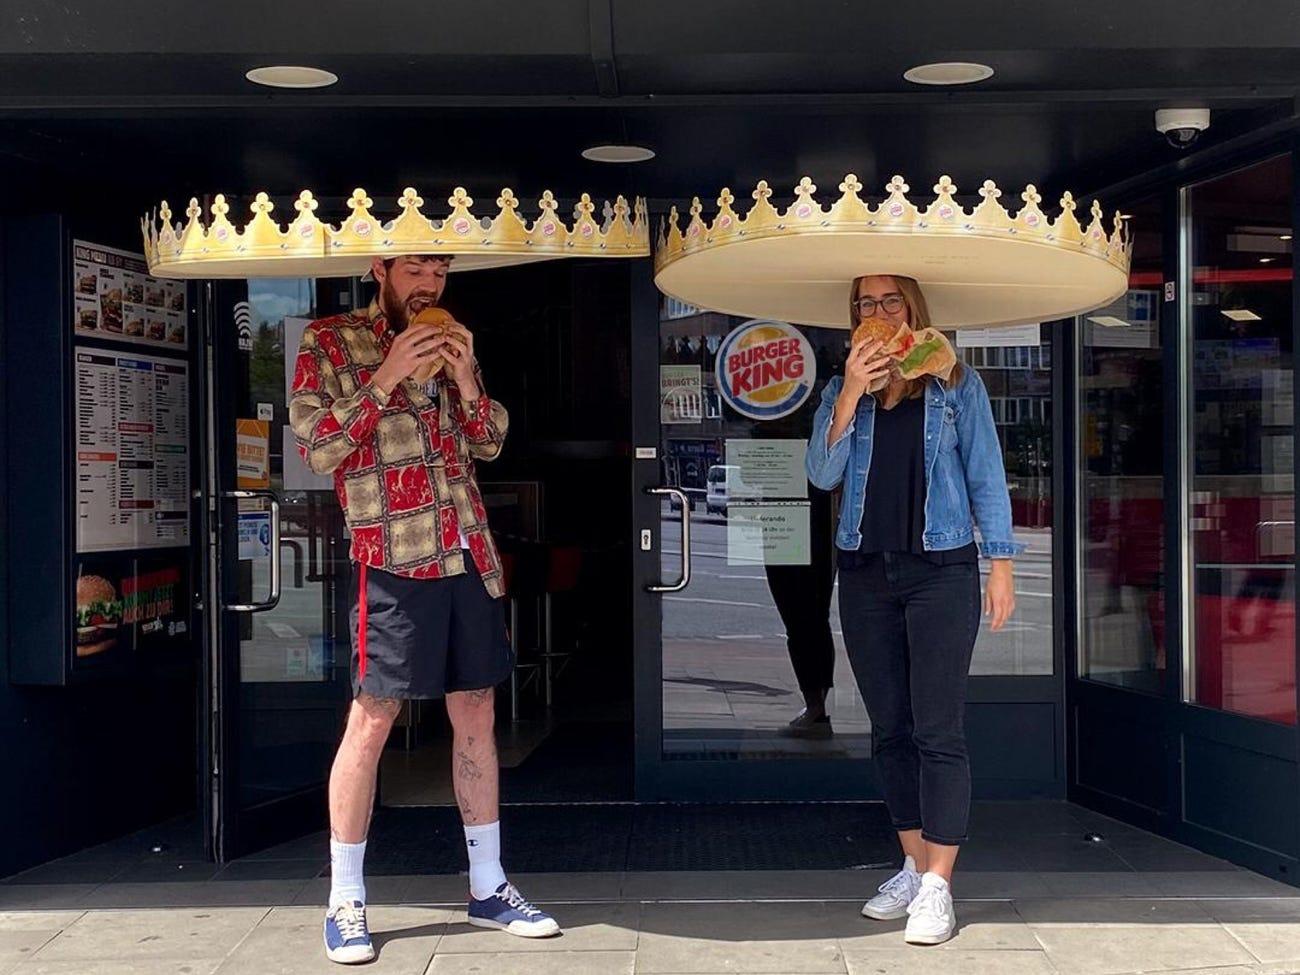 Burger King Almanya'dan Sosyal Mesafe Tacı